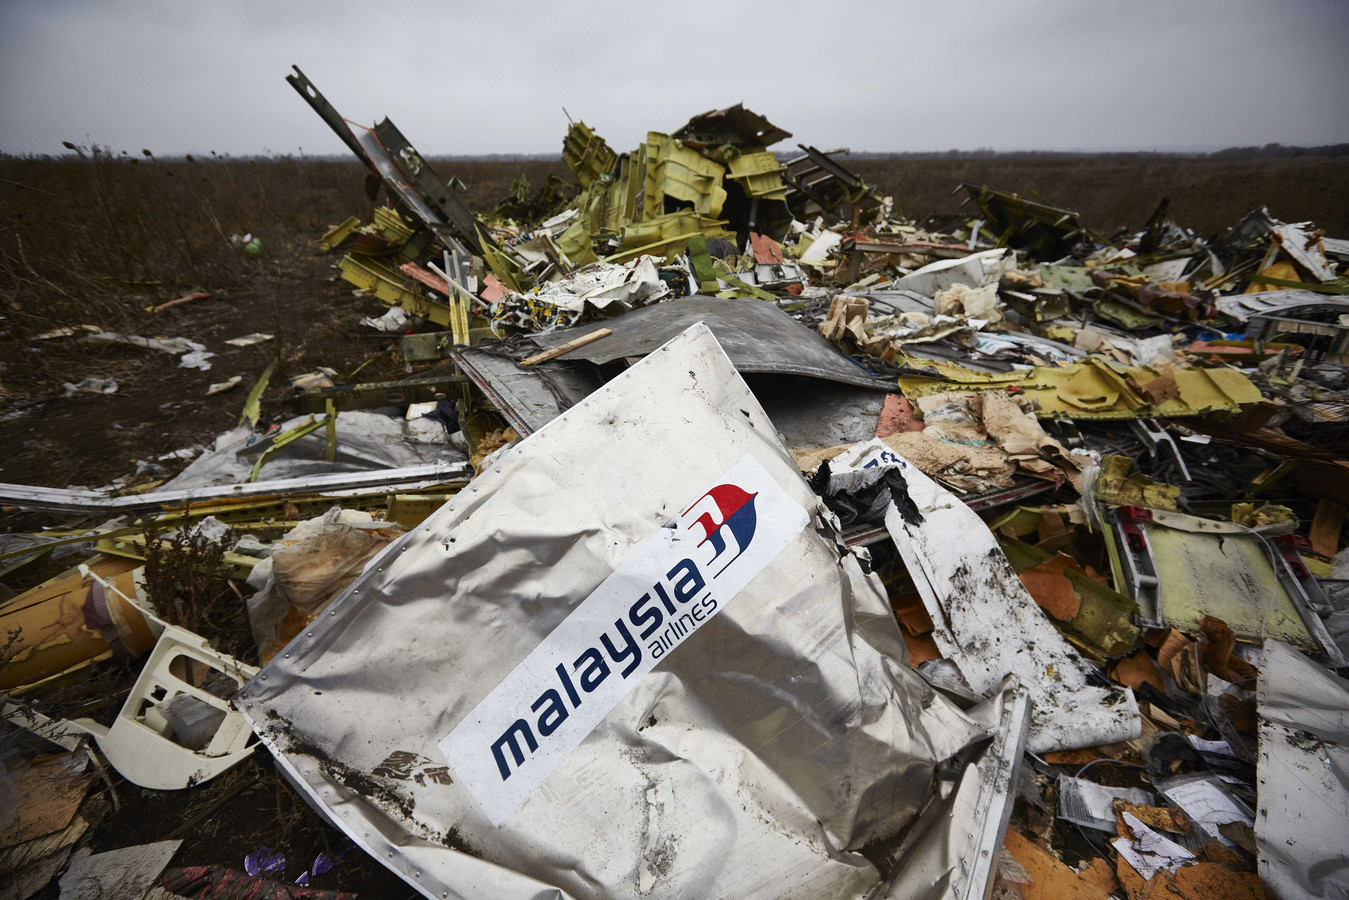 Wrakstukken van MH17 in Oekraïne in november 2014.